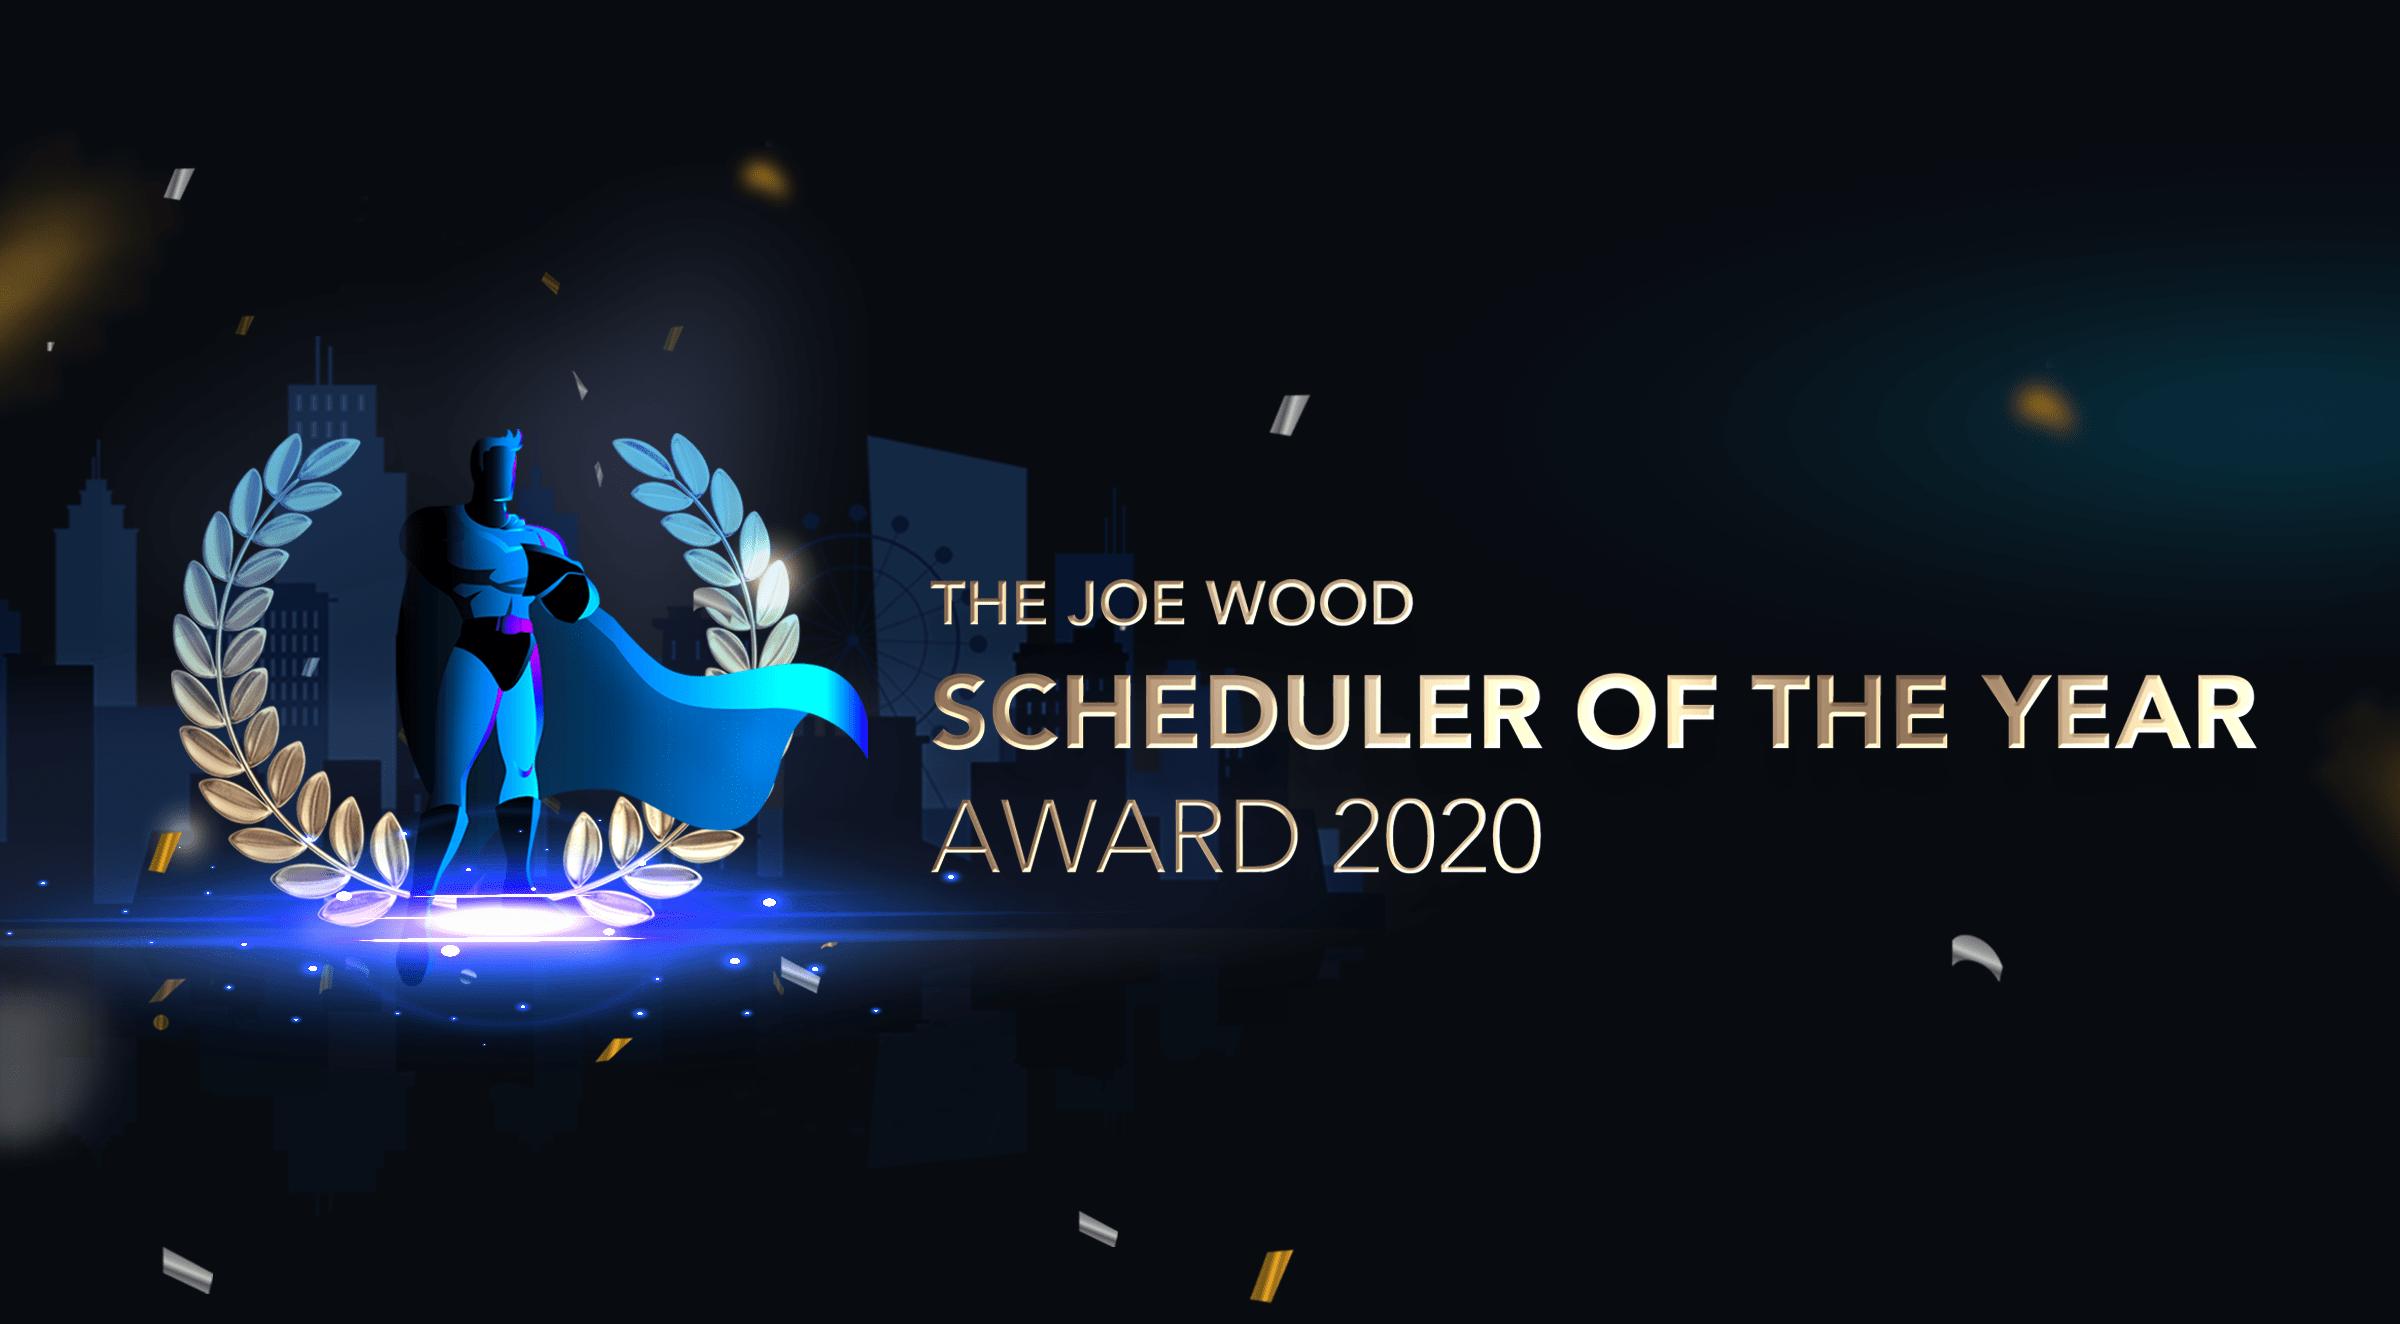 The Joe Wood Scheduler of the Year Award 2020